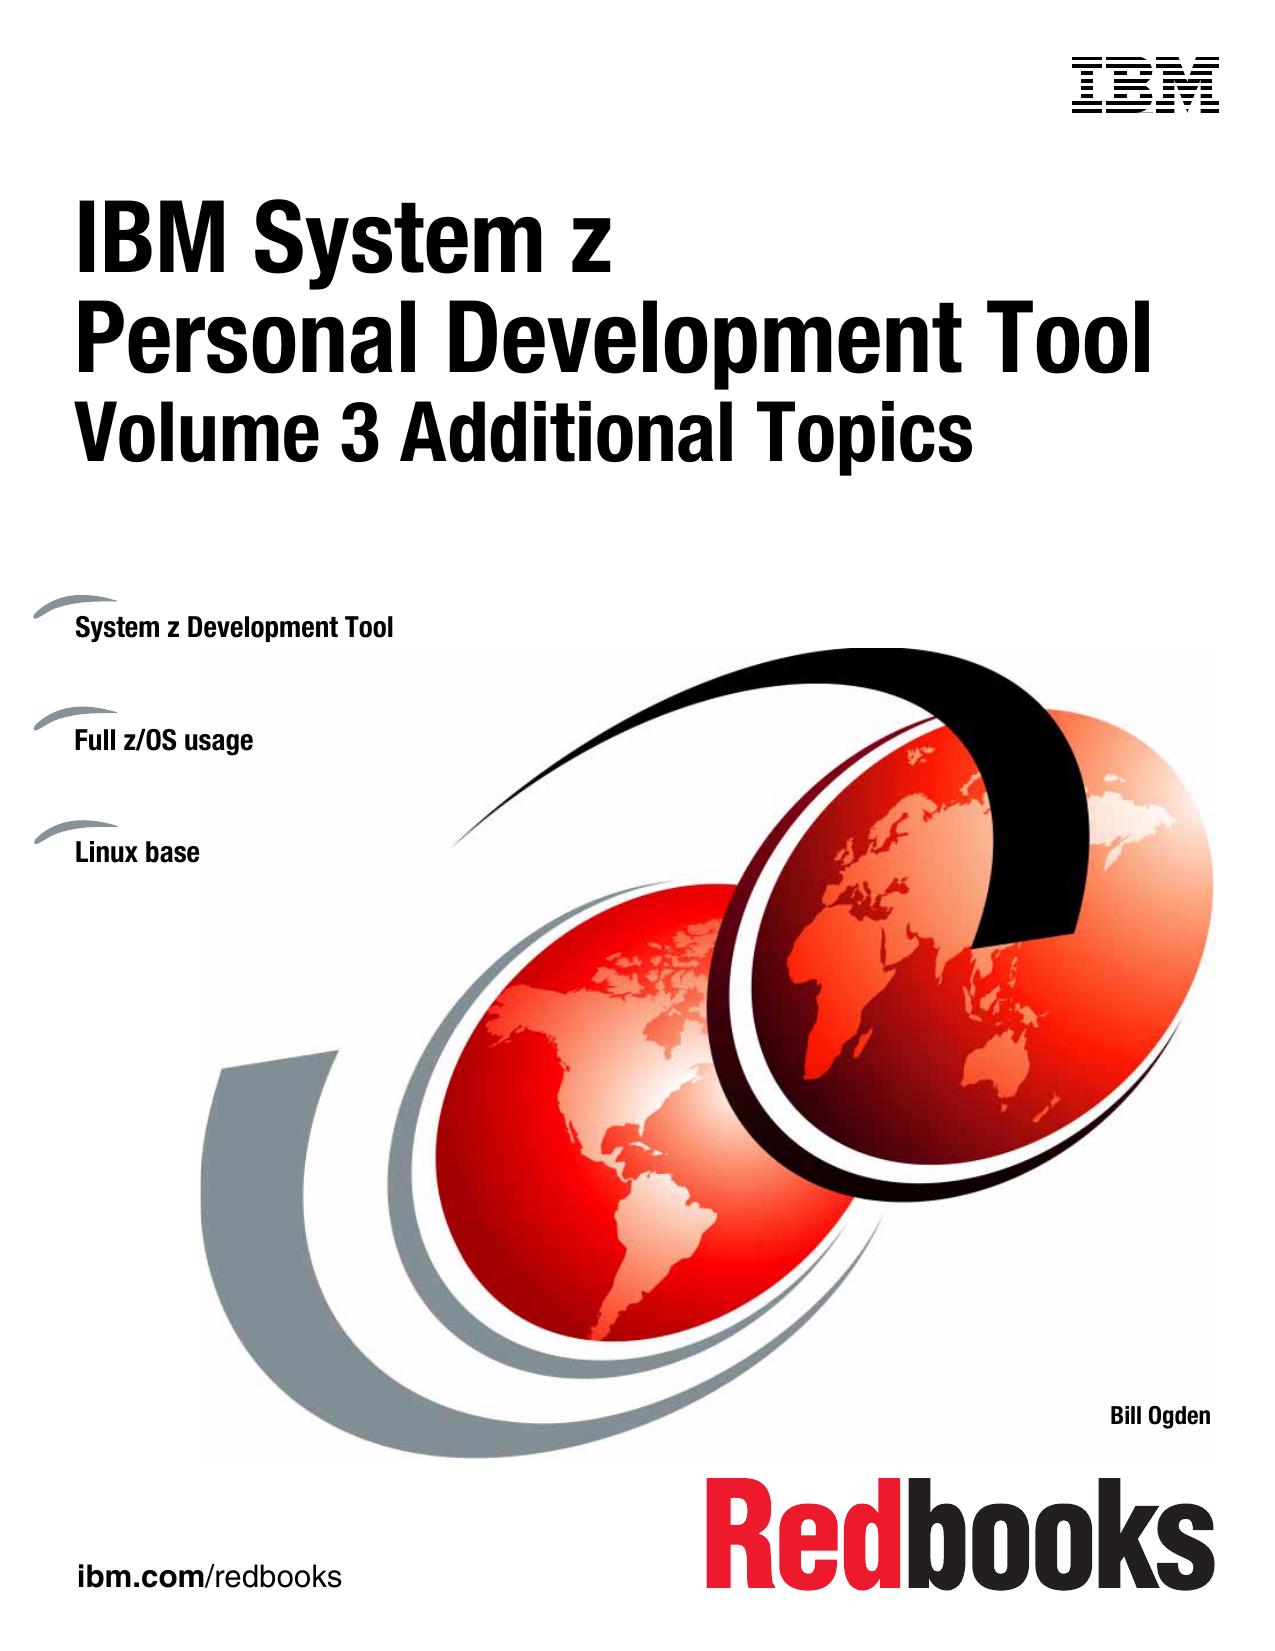 IBM System z Personal Development Tool Volume 3 Additional